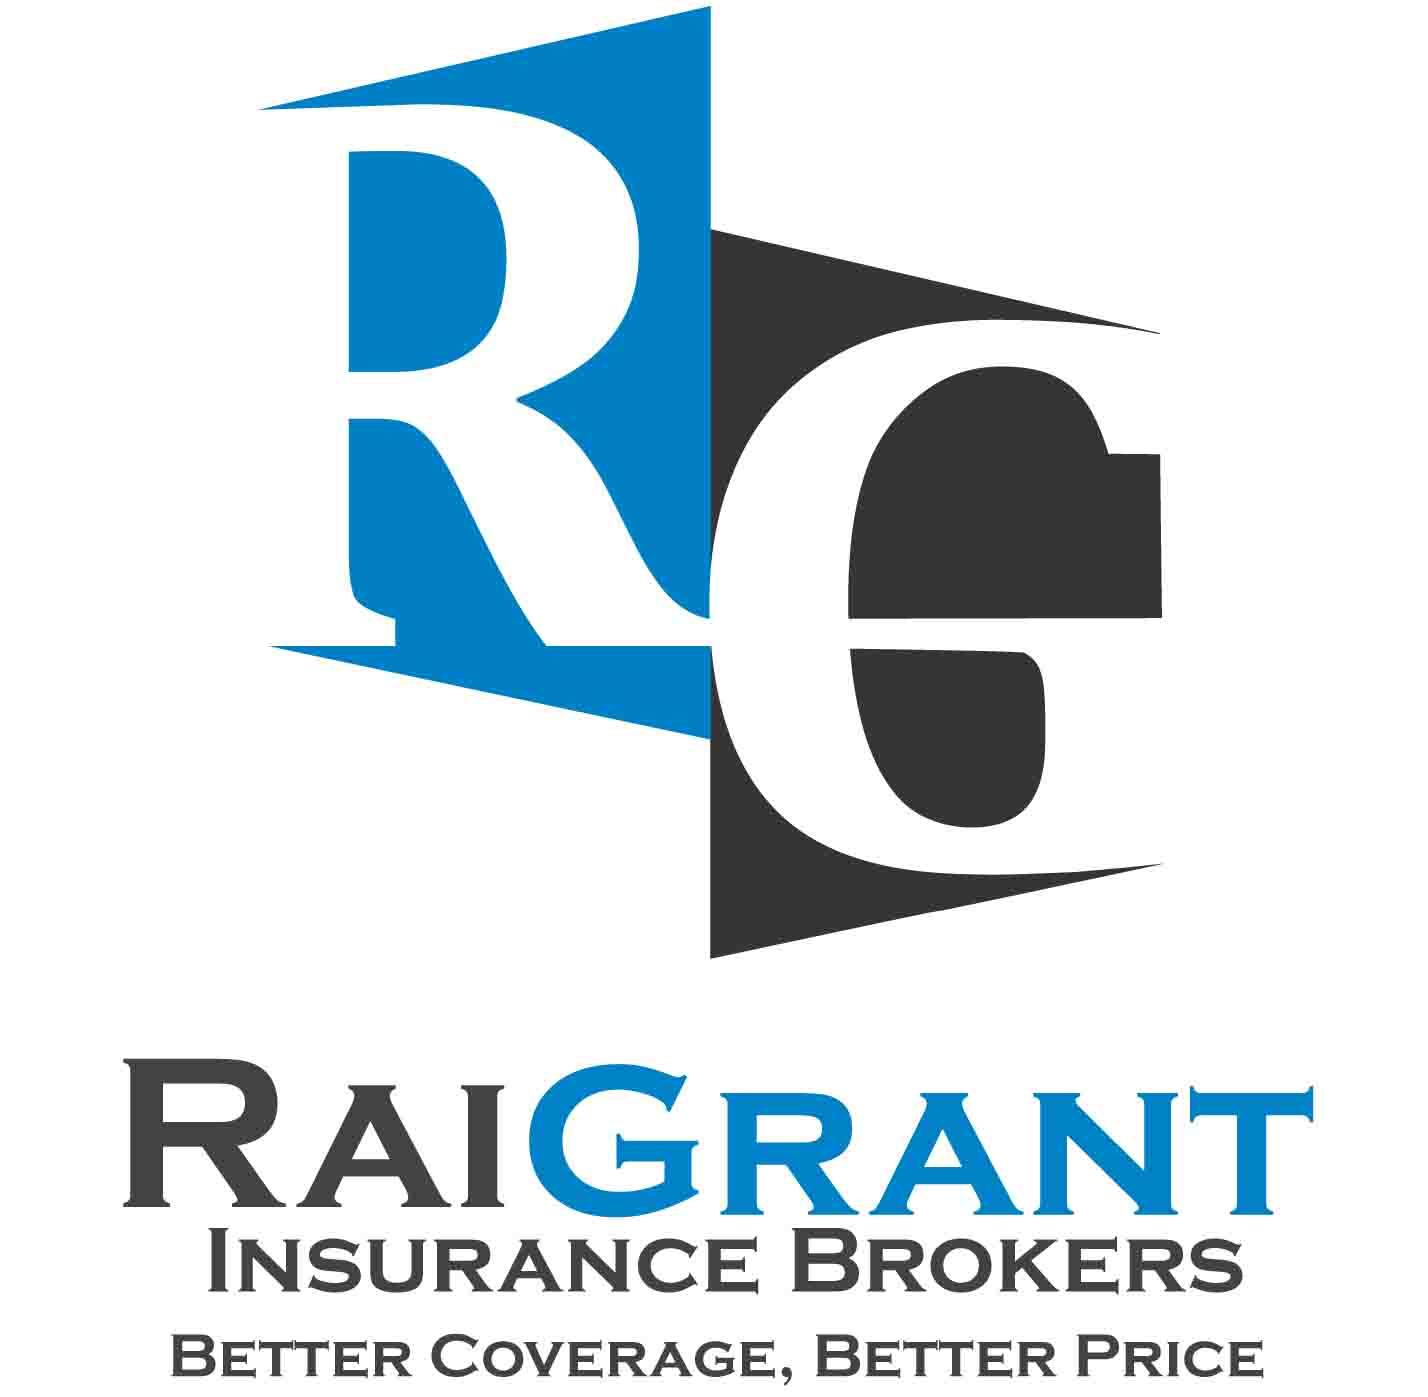 raigrant-insurance-brokers---2017-02-17